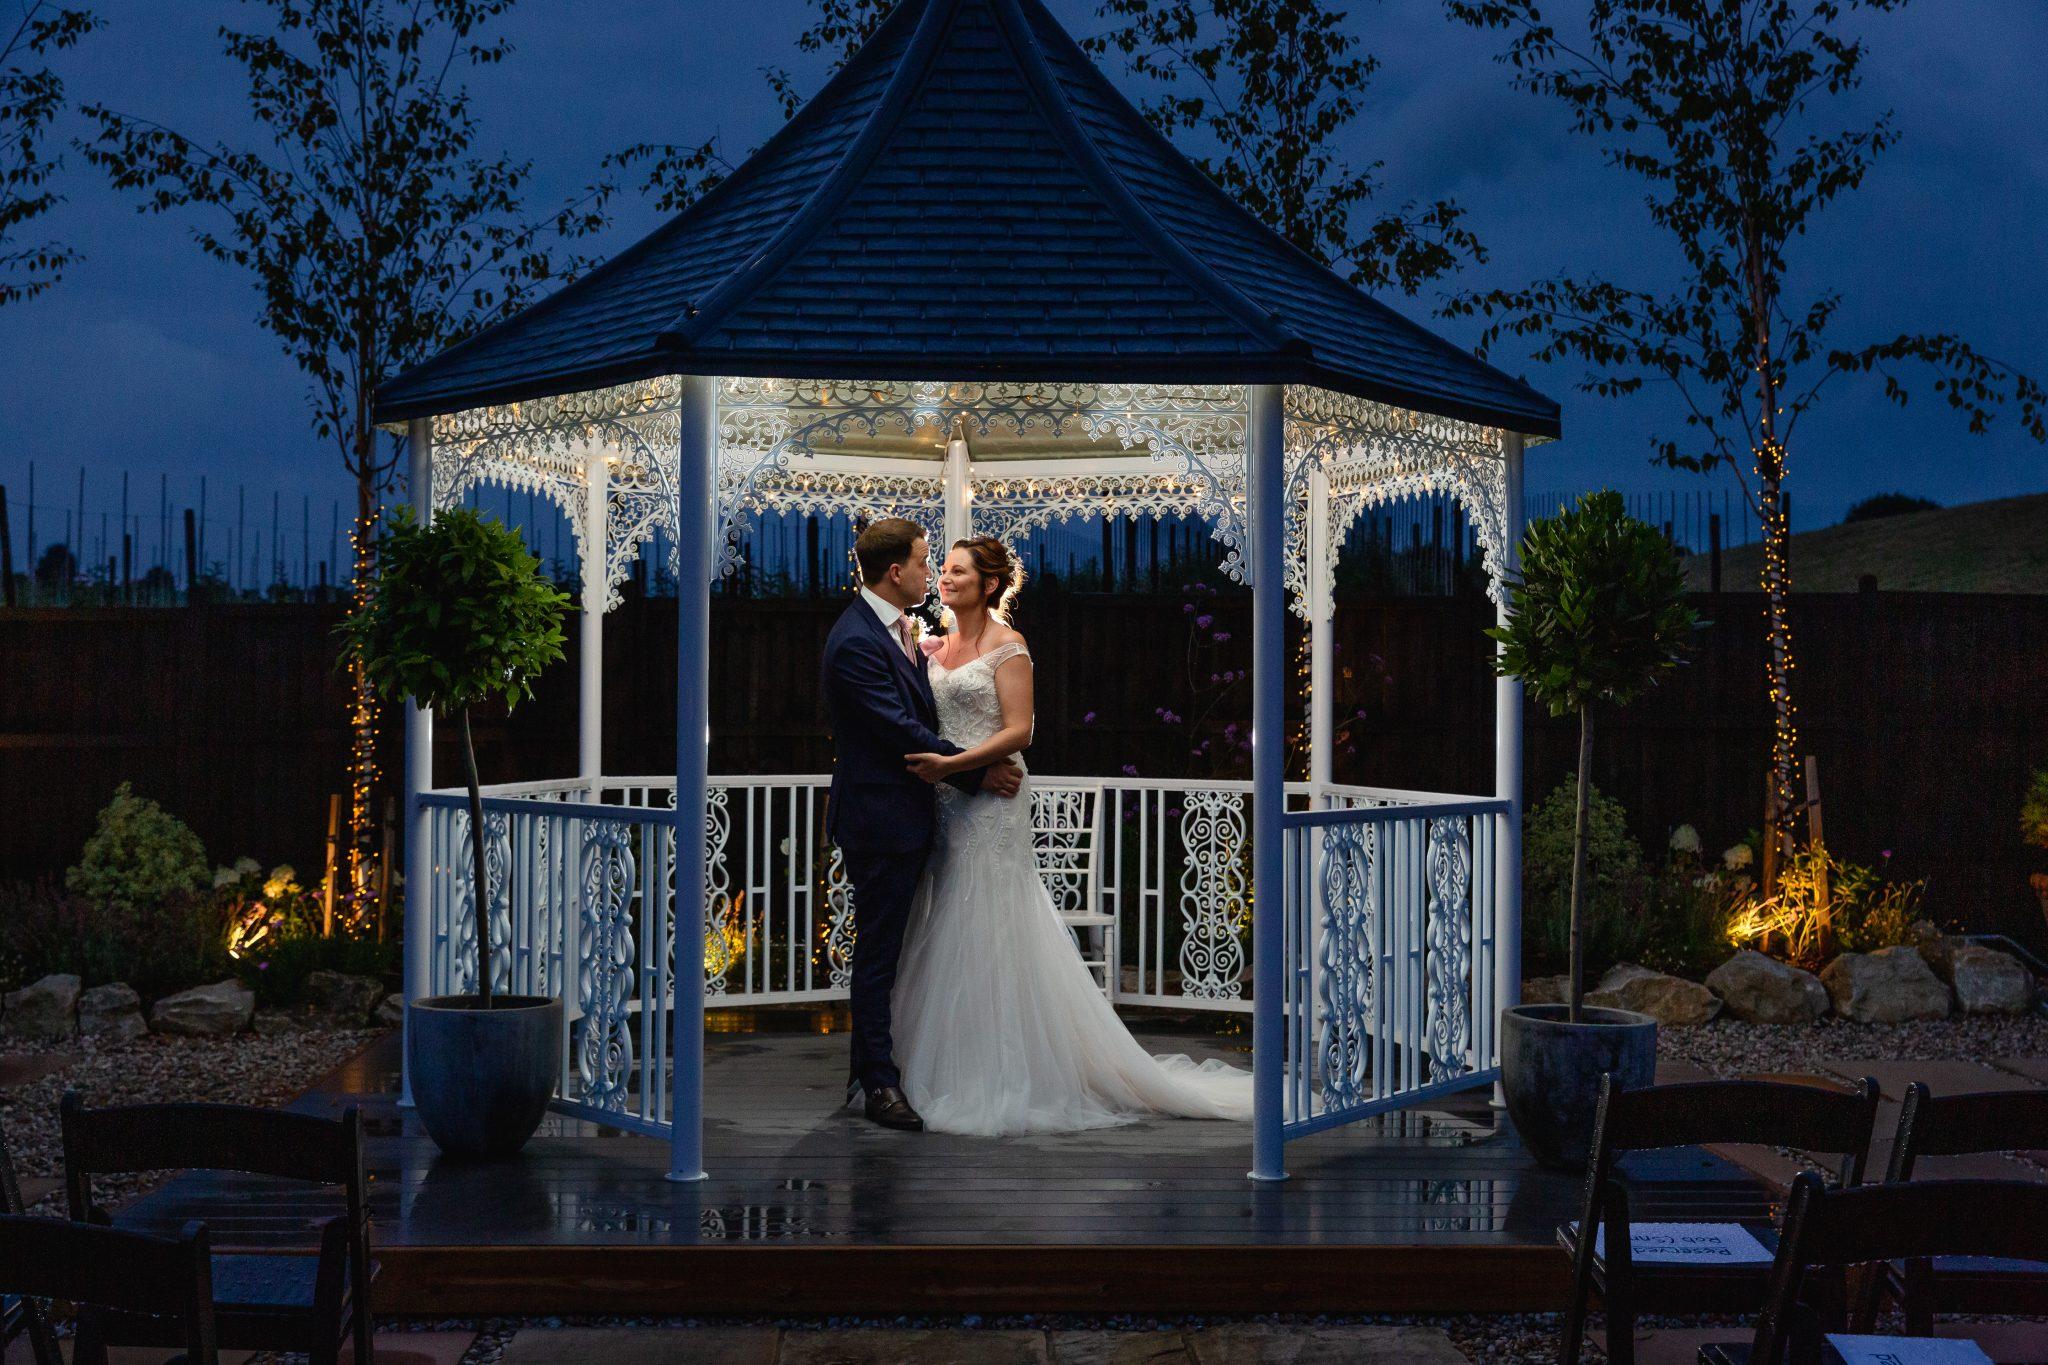 The Barnyard wedding photos